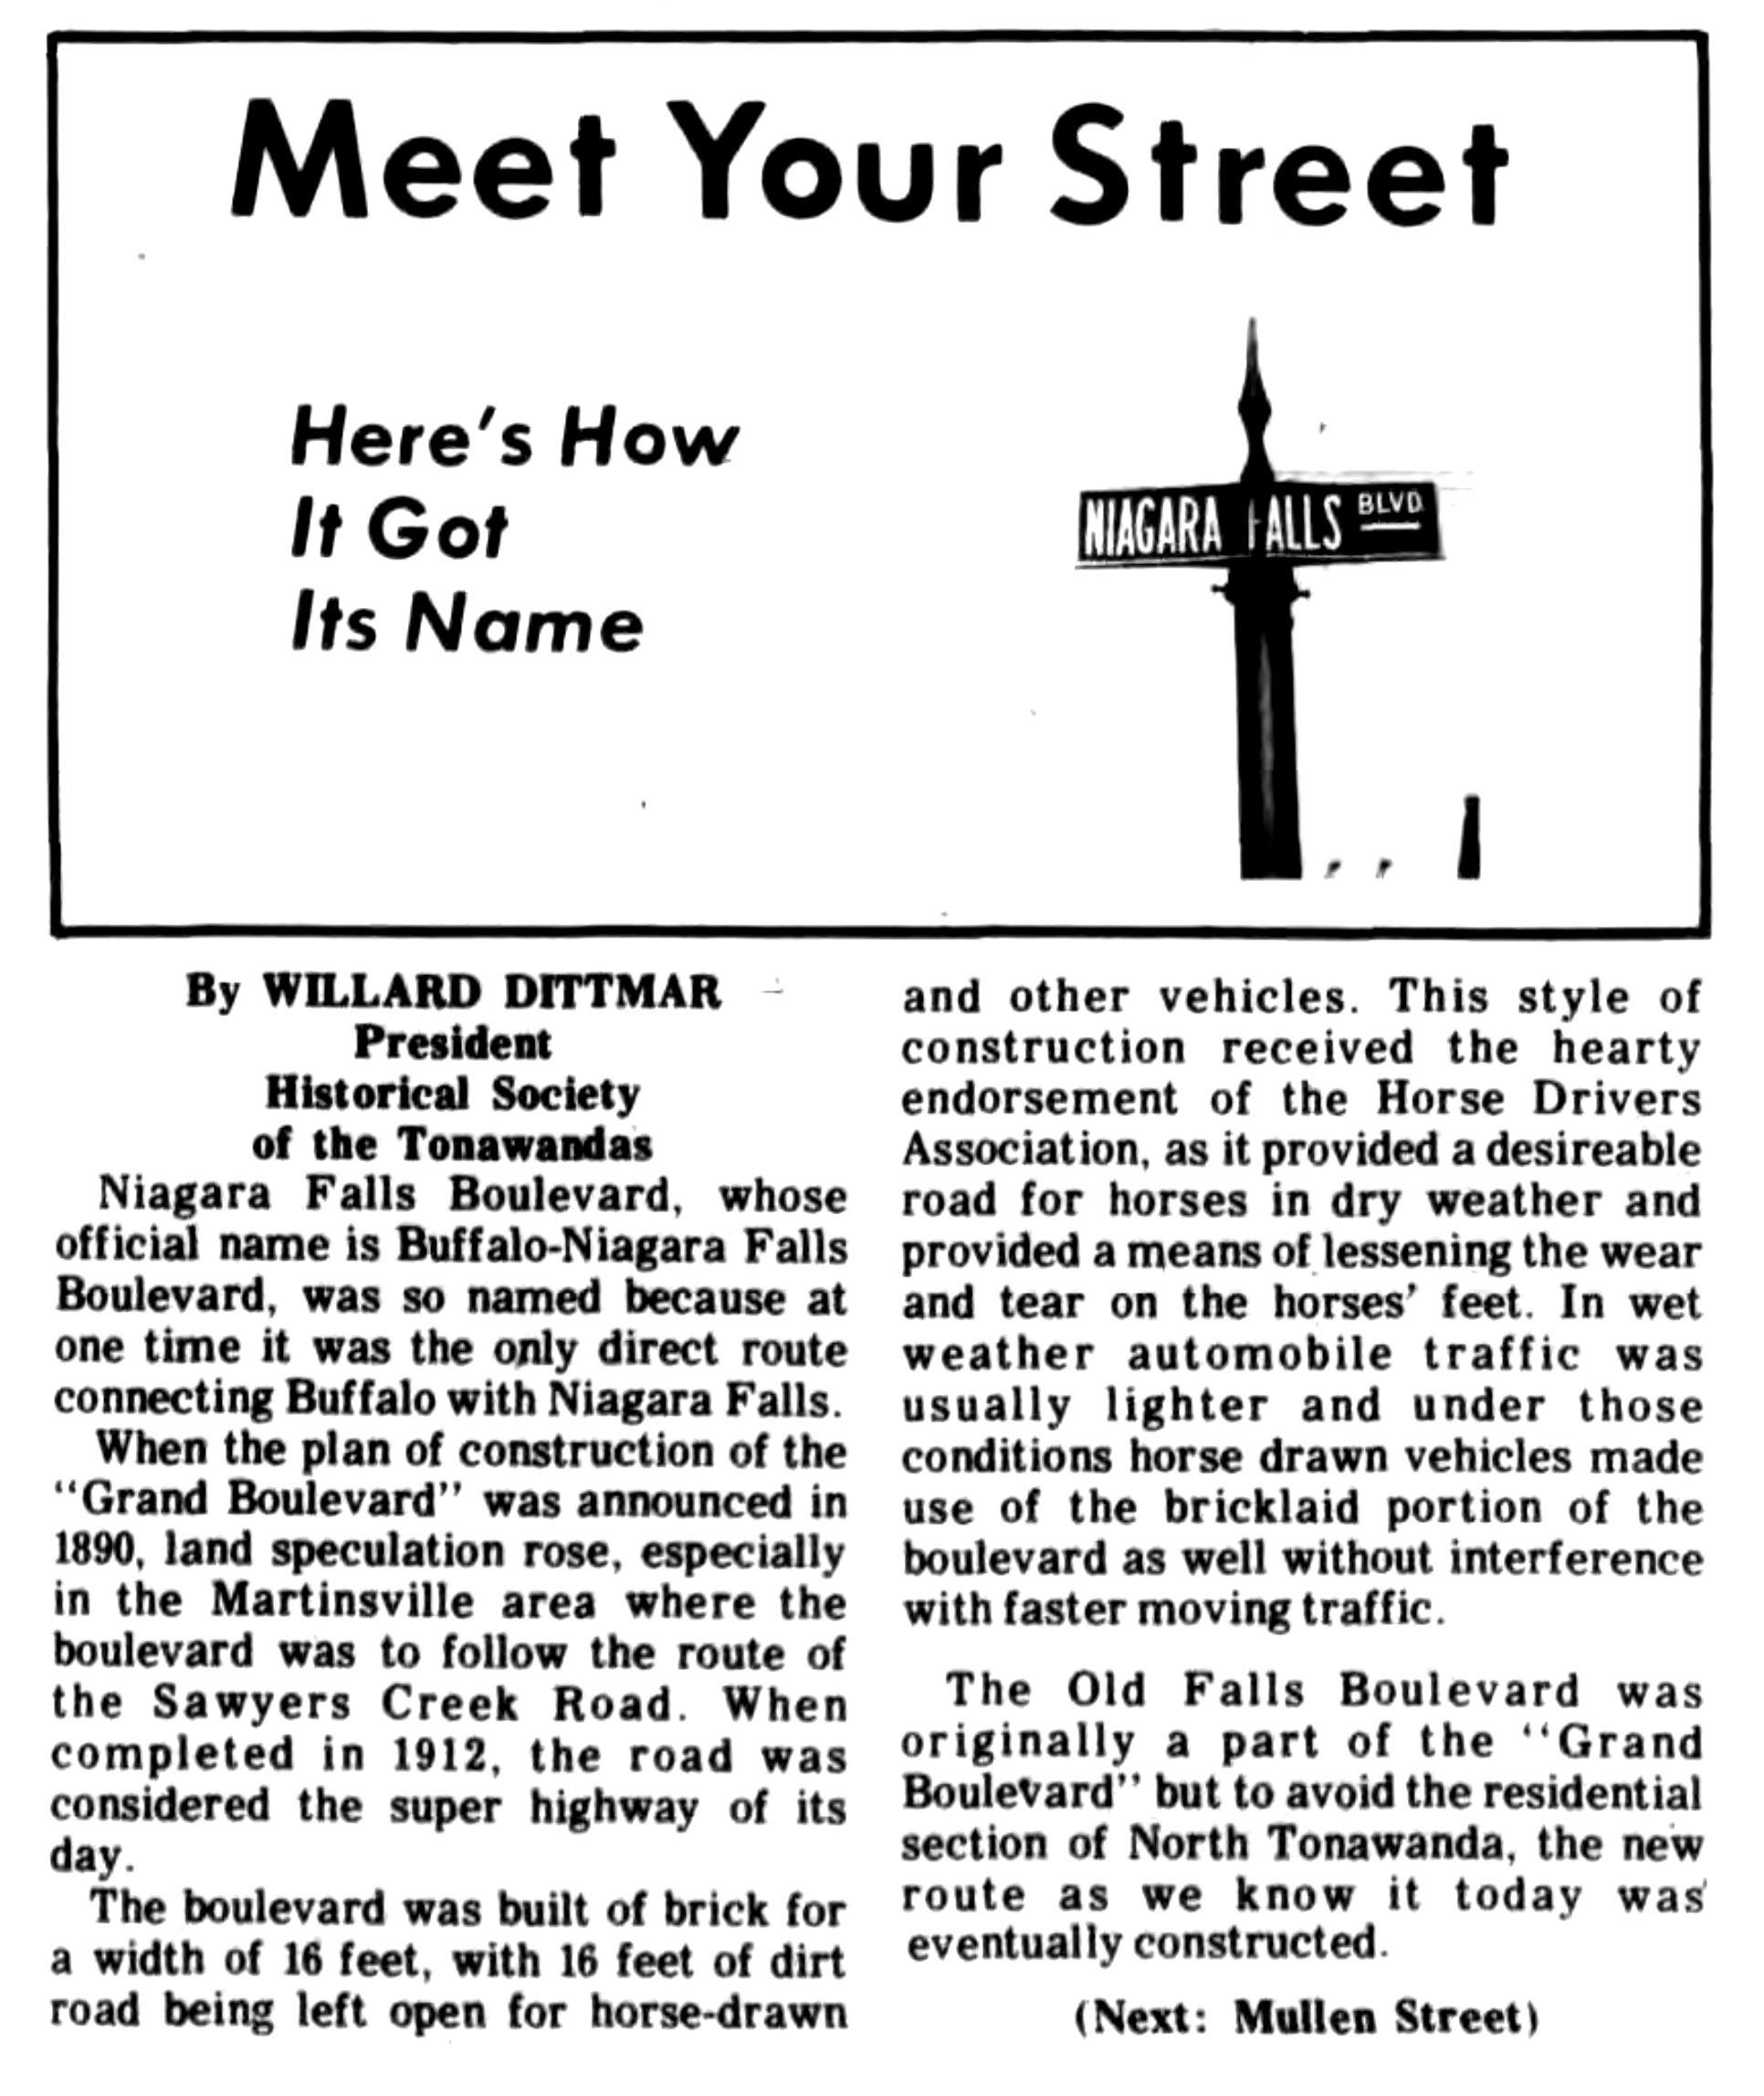 Meet Your Street - Niagara Falls Blvd (Tonawanada News, 1970-10-17).jpg